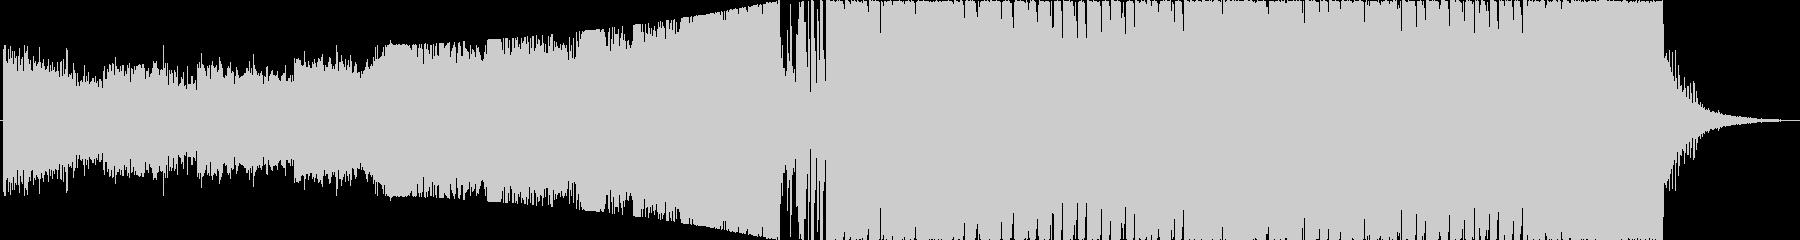 Overture/ストリングス・EDMの未再生の波形